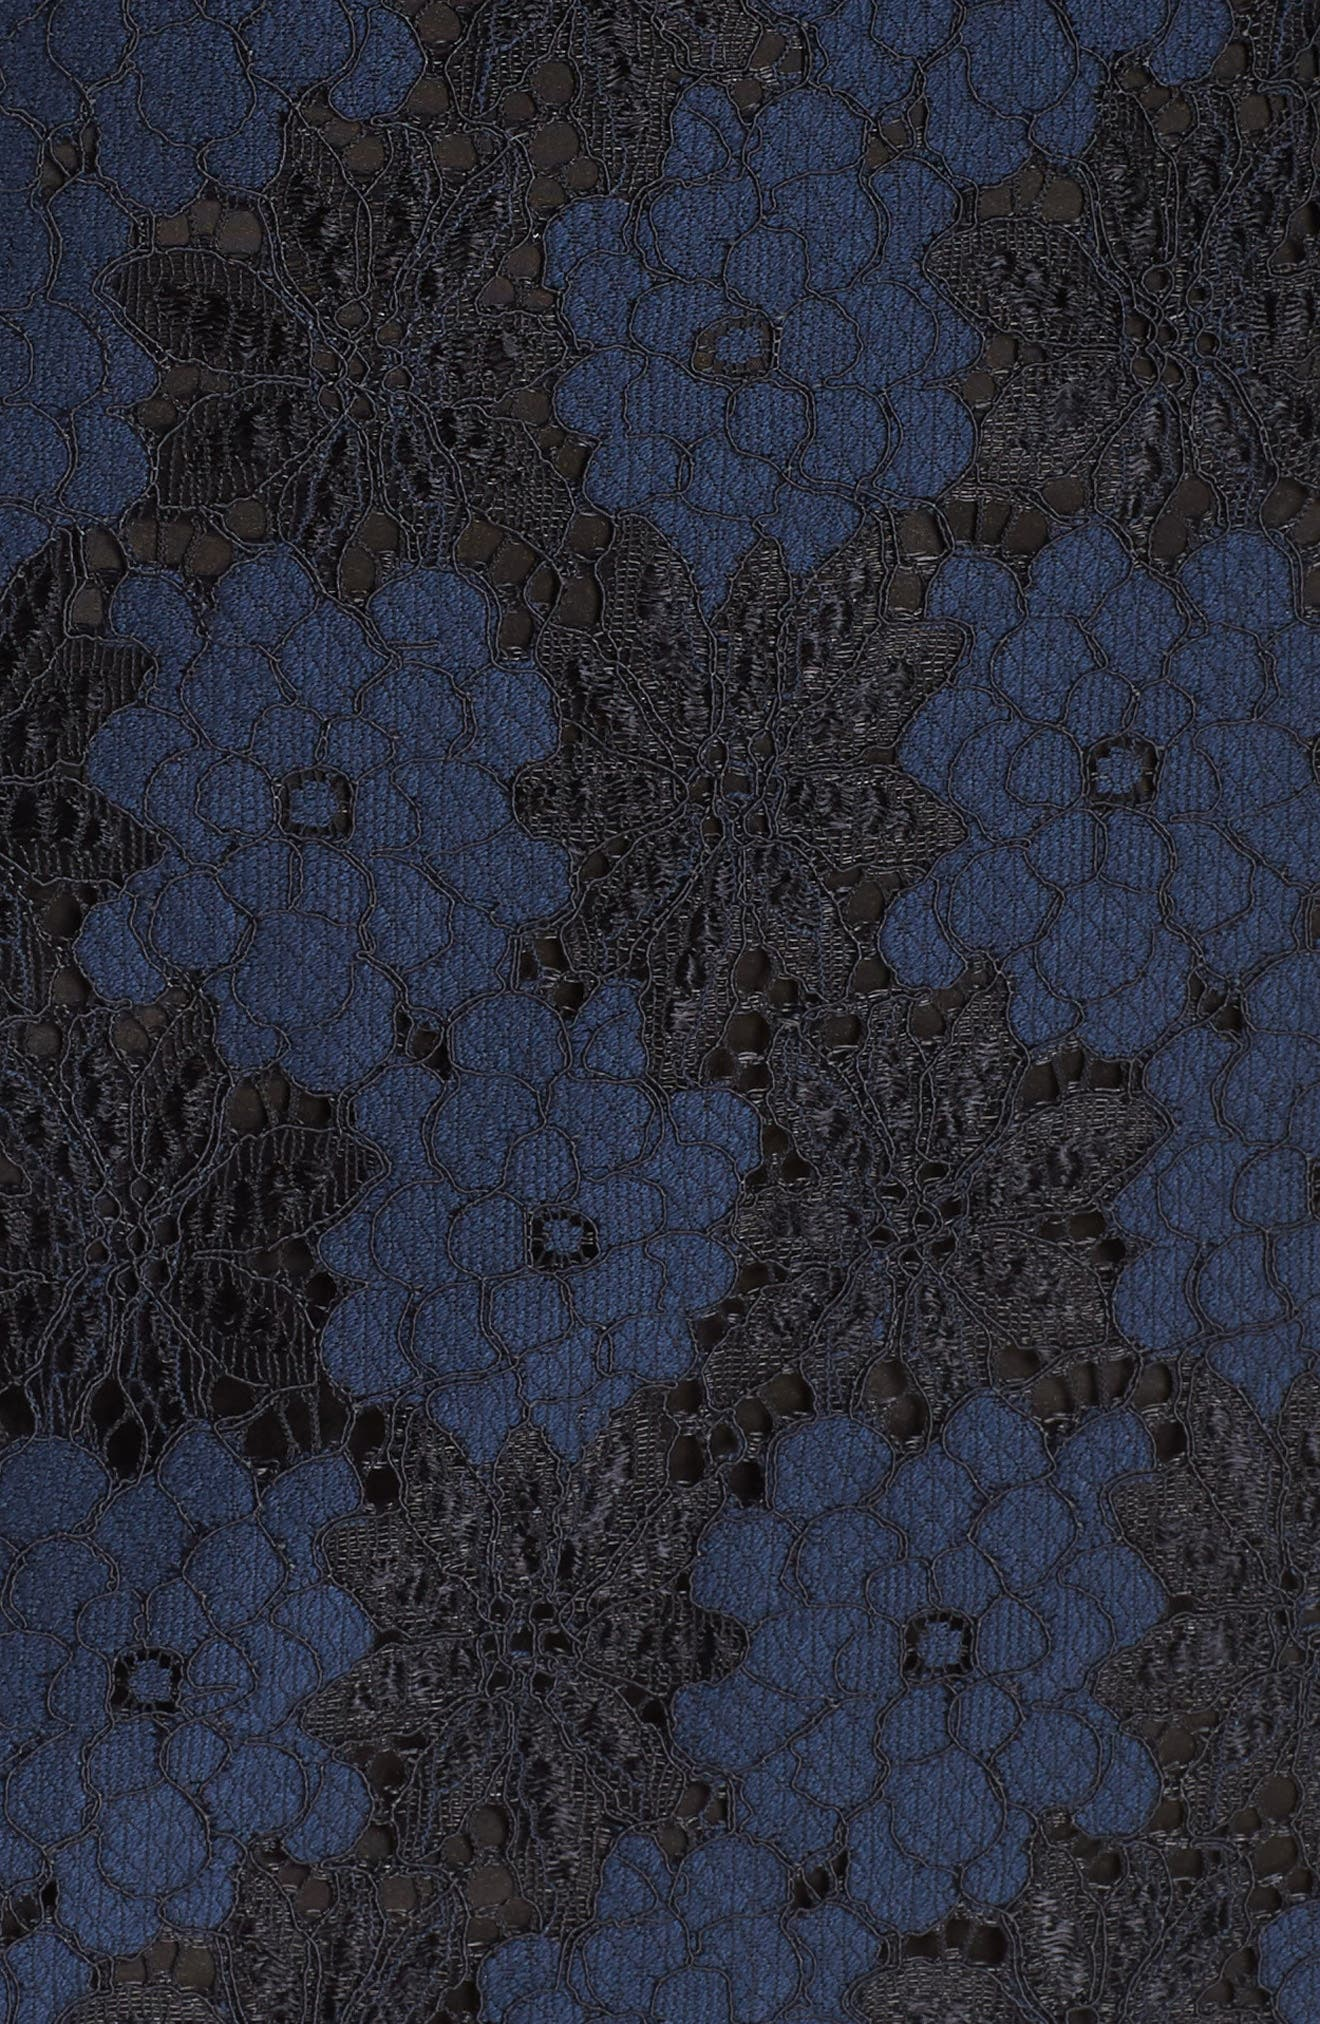 Two-Tone Lace Shift Dress,                             Alternate thumbnail 5, color,                             BLACK/ BLUE FLOWER